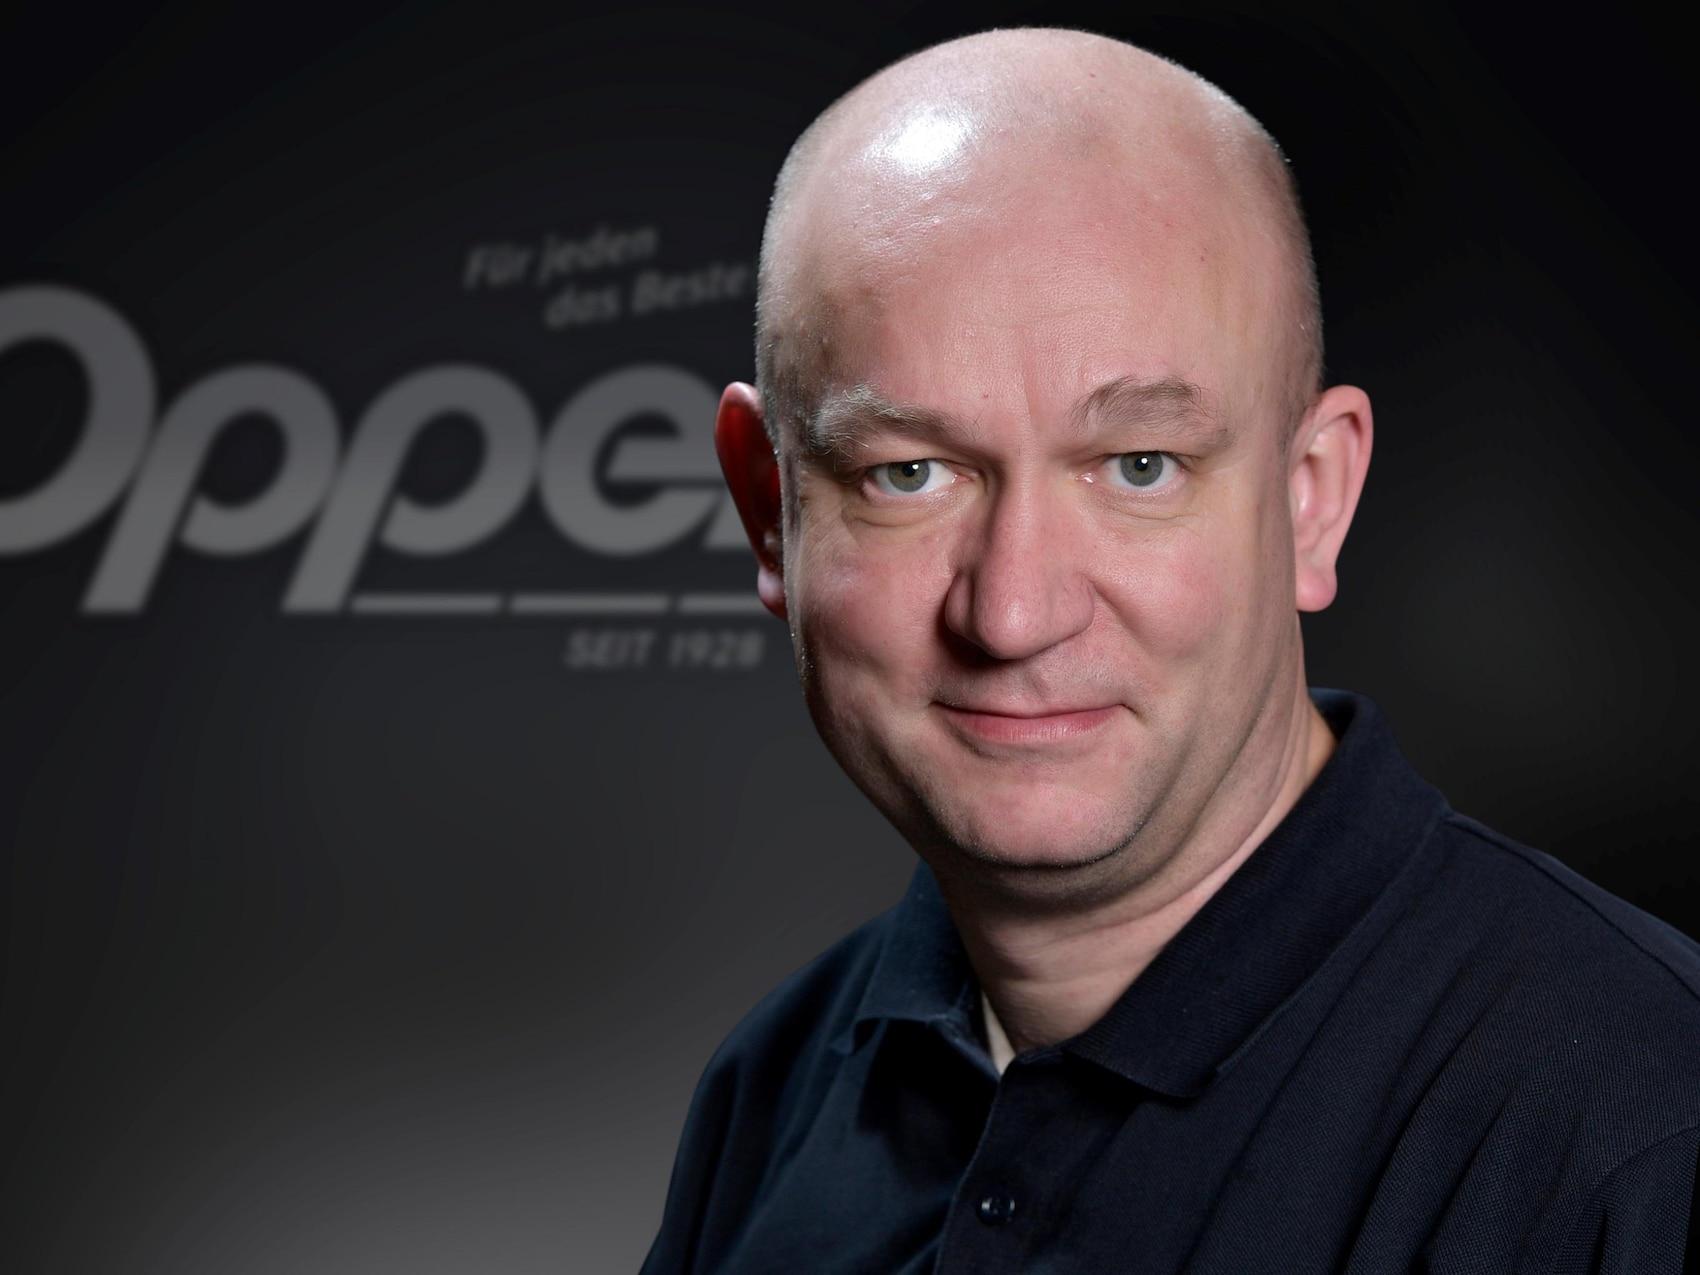 team-sSP-Oppel-GmbH-Aue-Wagner-Axel